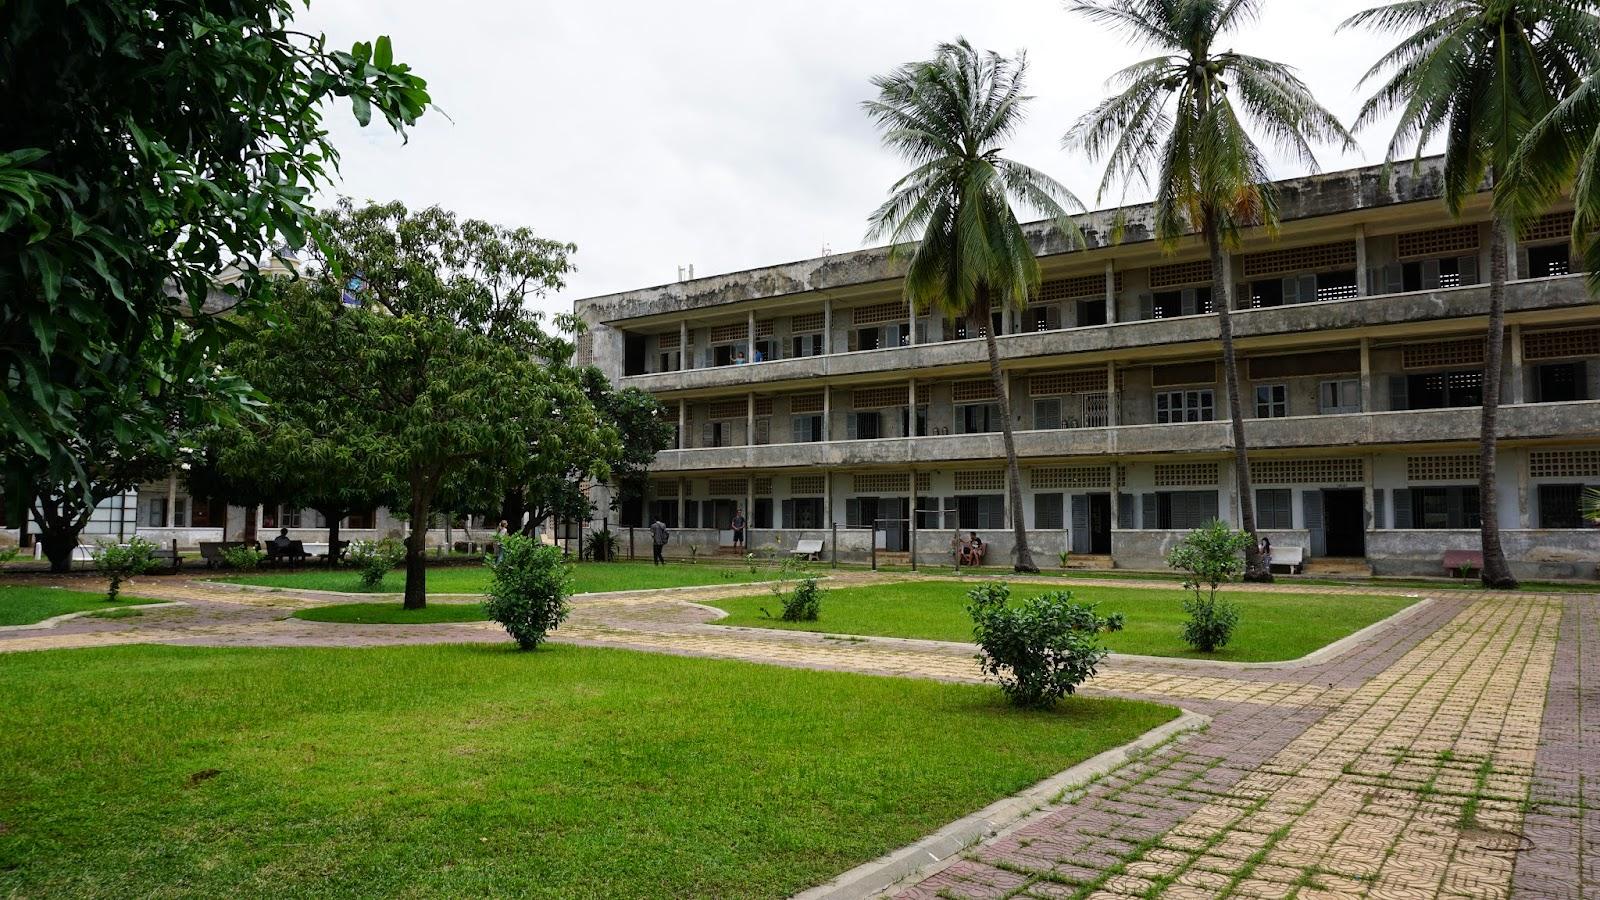 Inside Tuol Sleng Genocide Museum